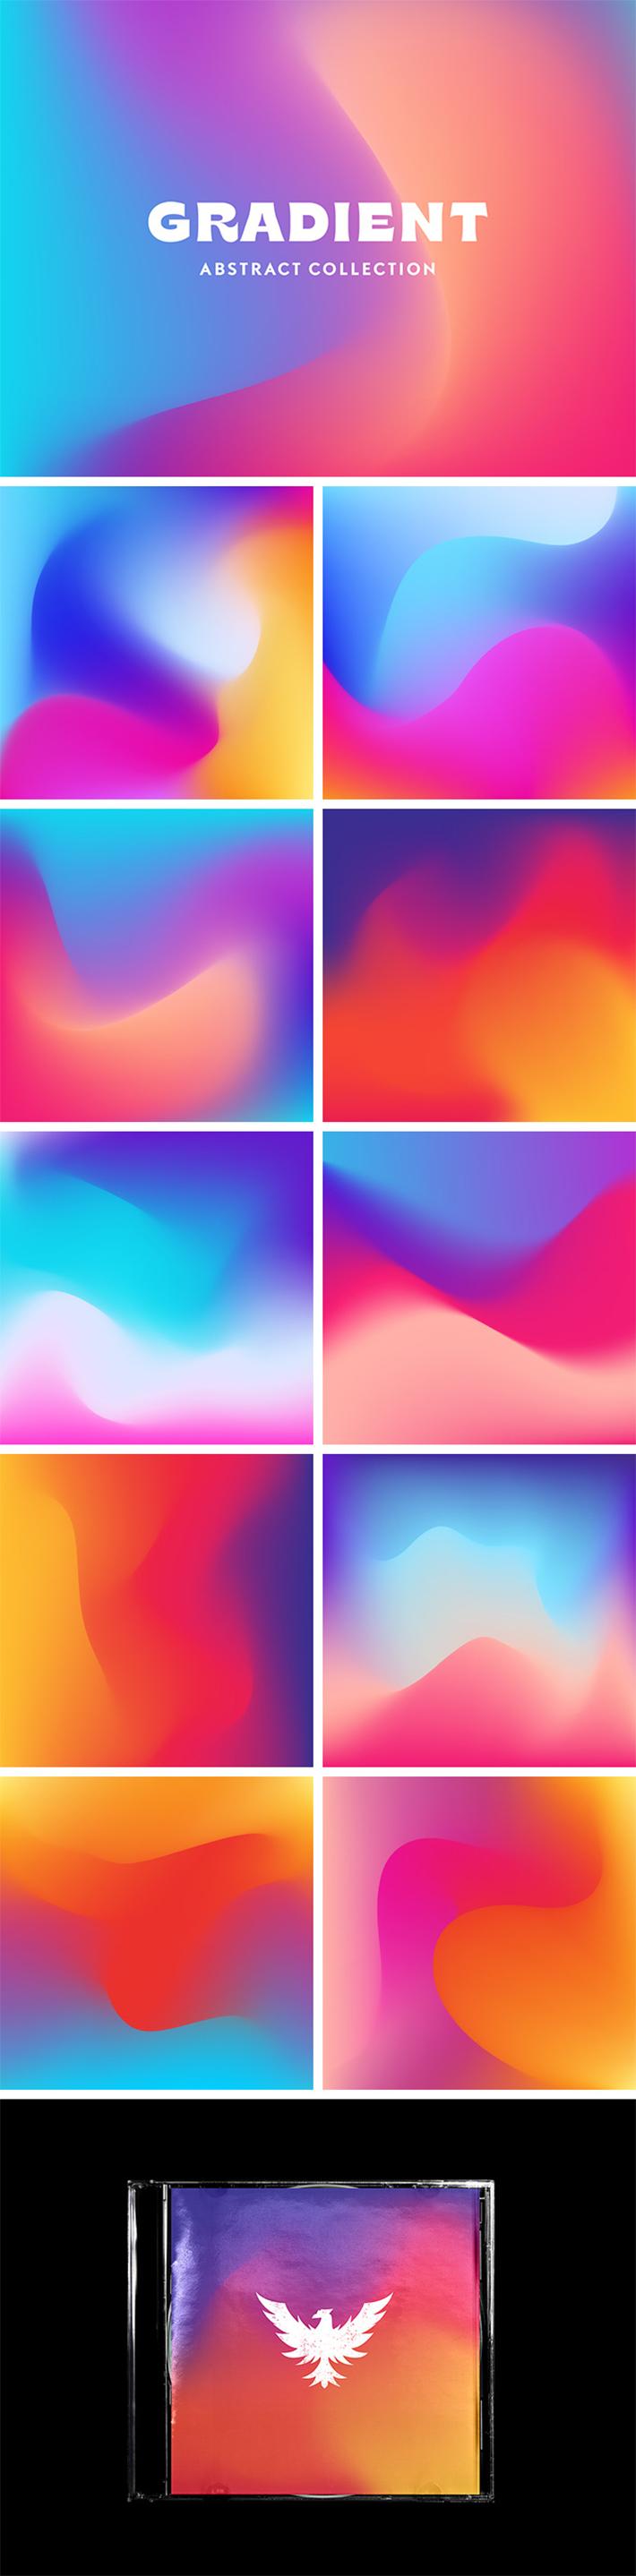 Gradient Texture Collection